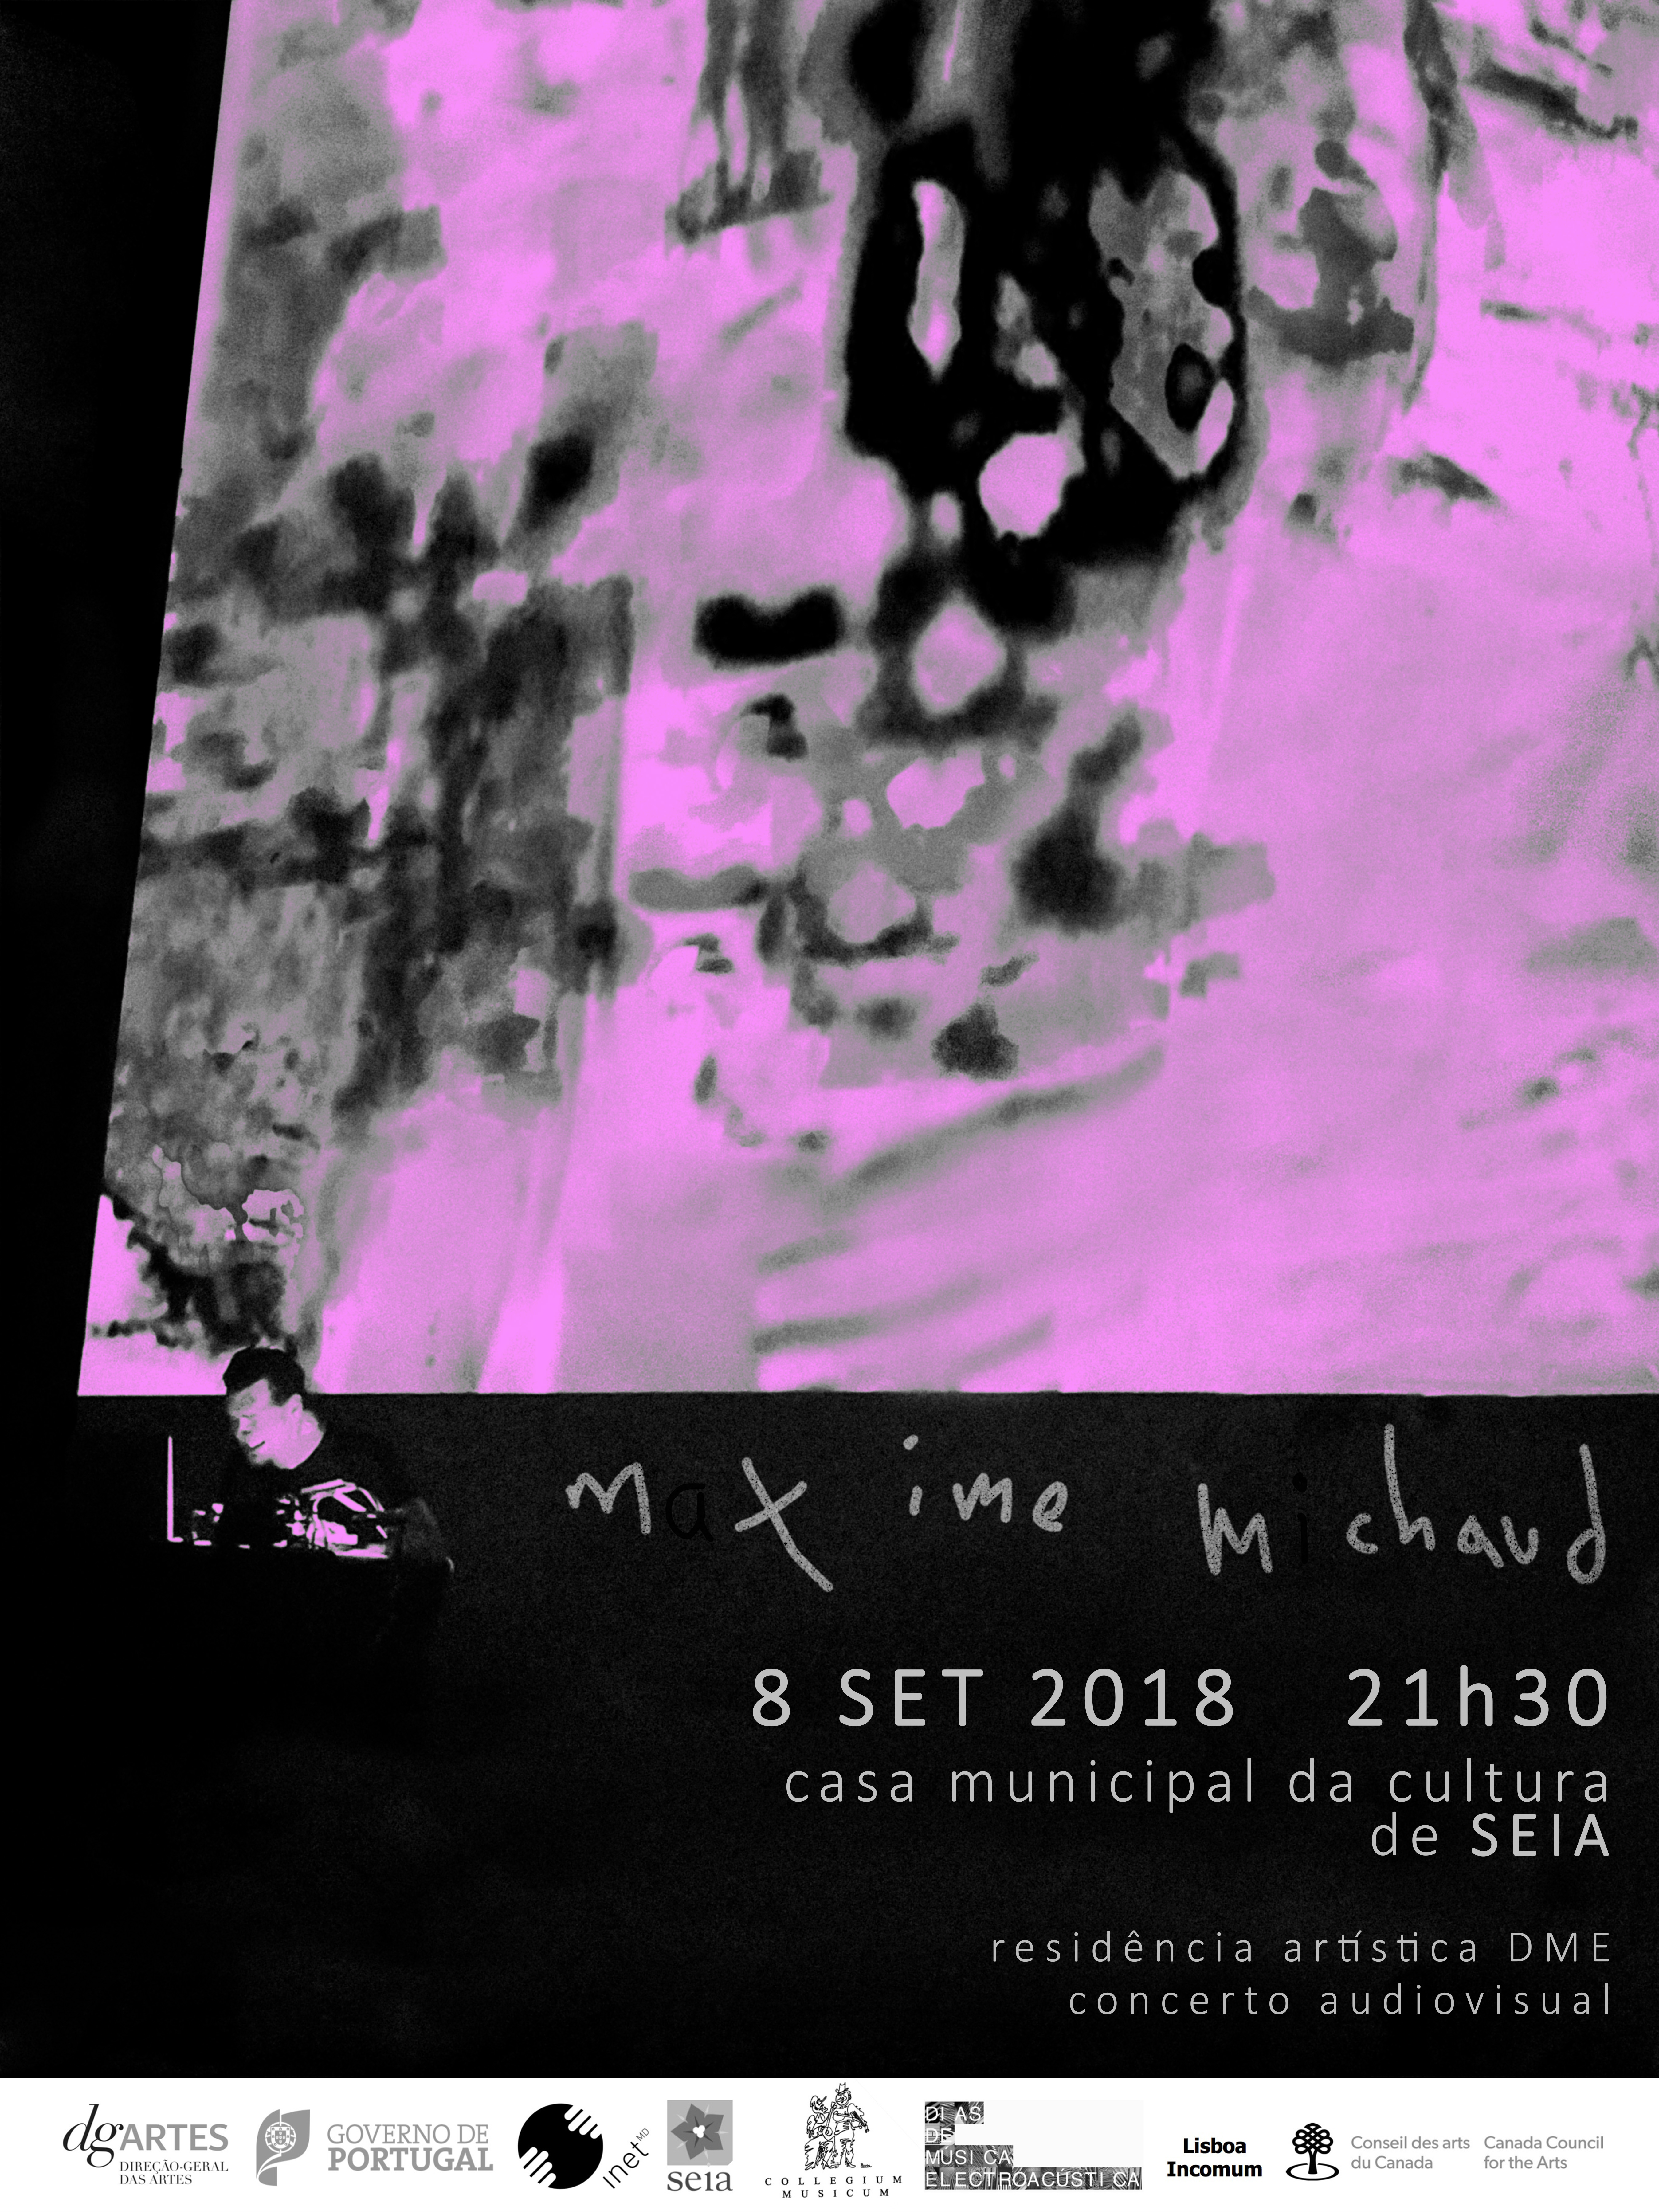 Concerto Maxime Michaud